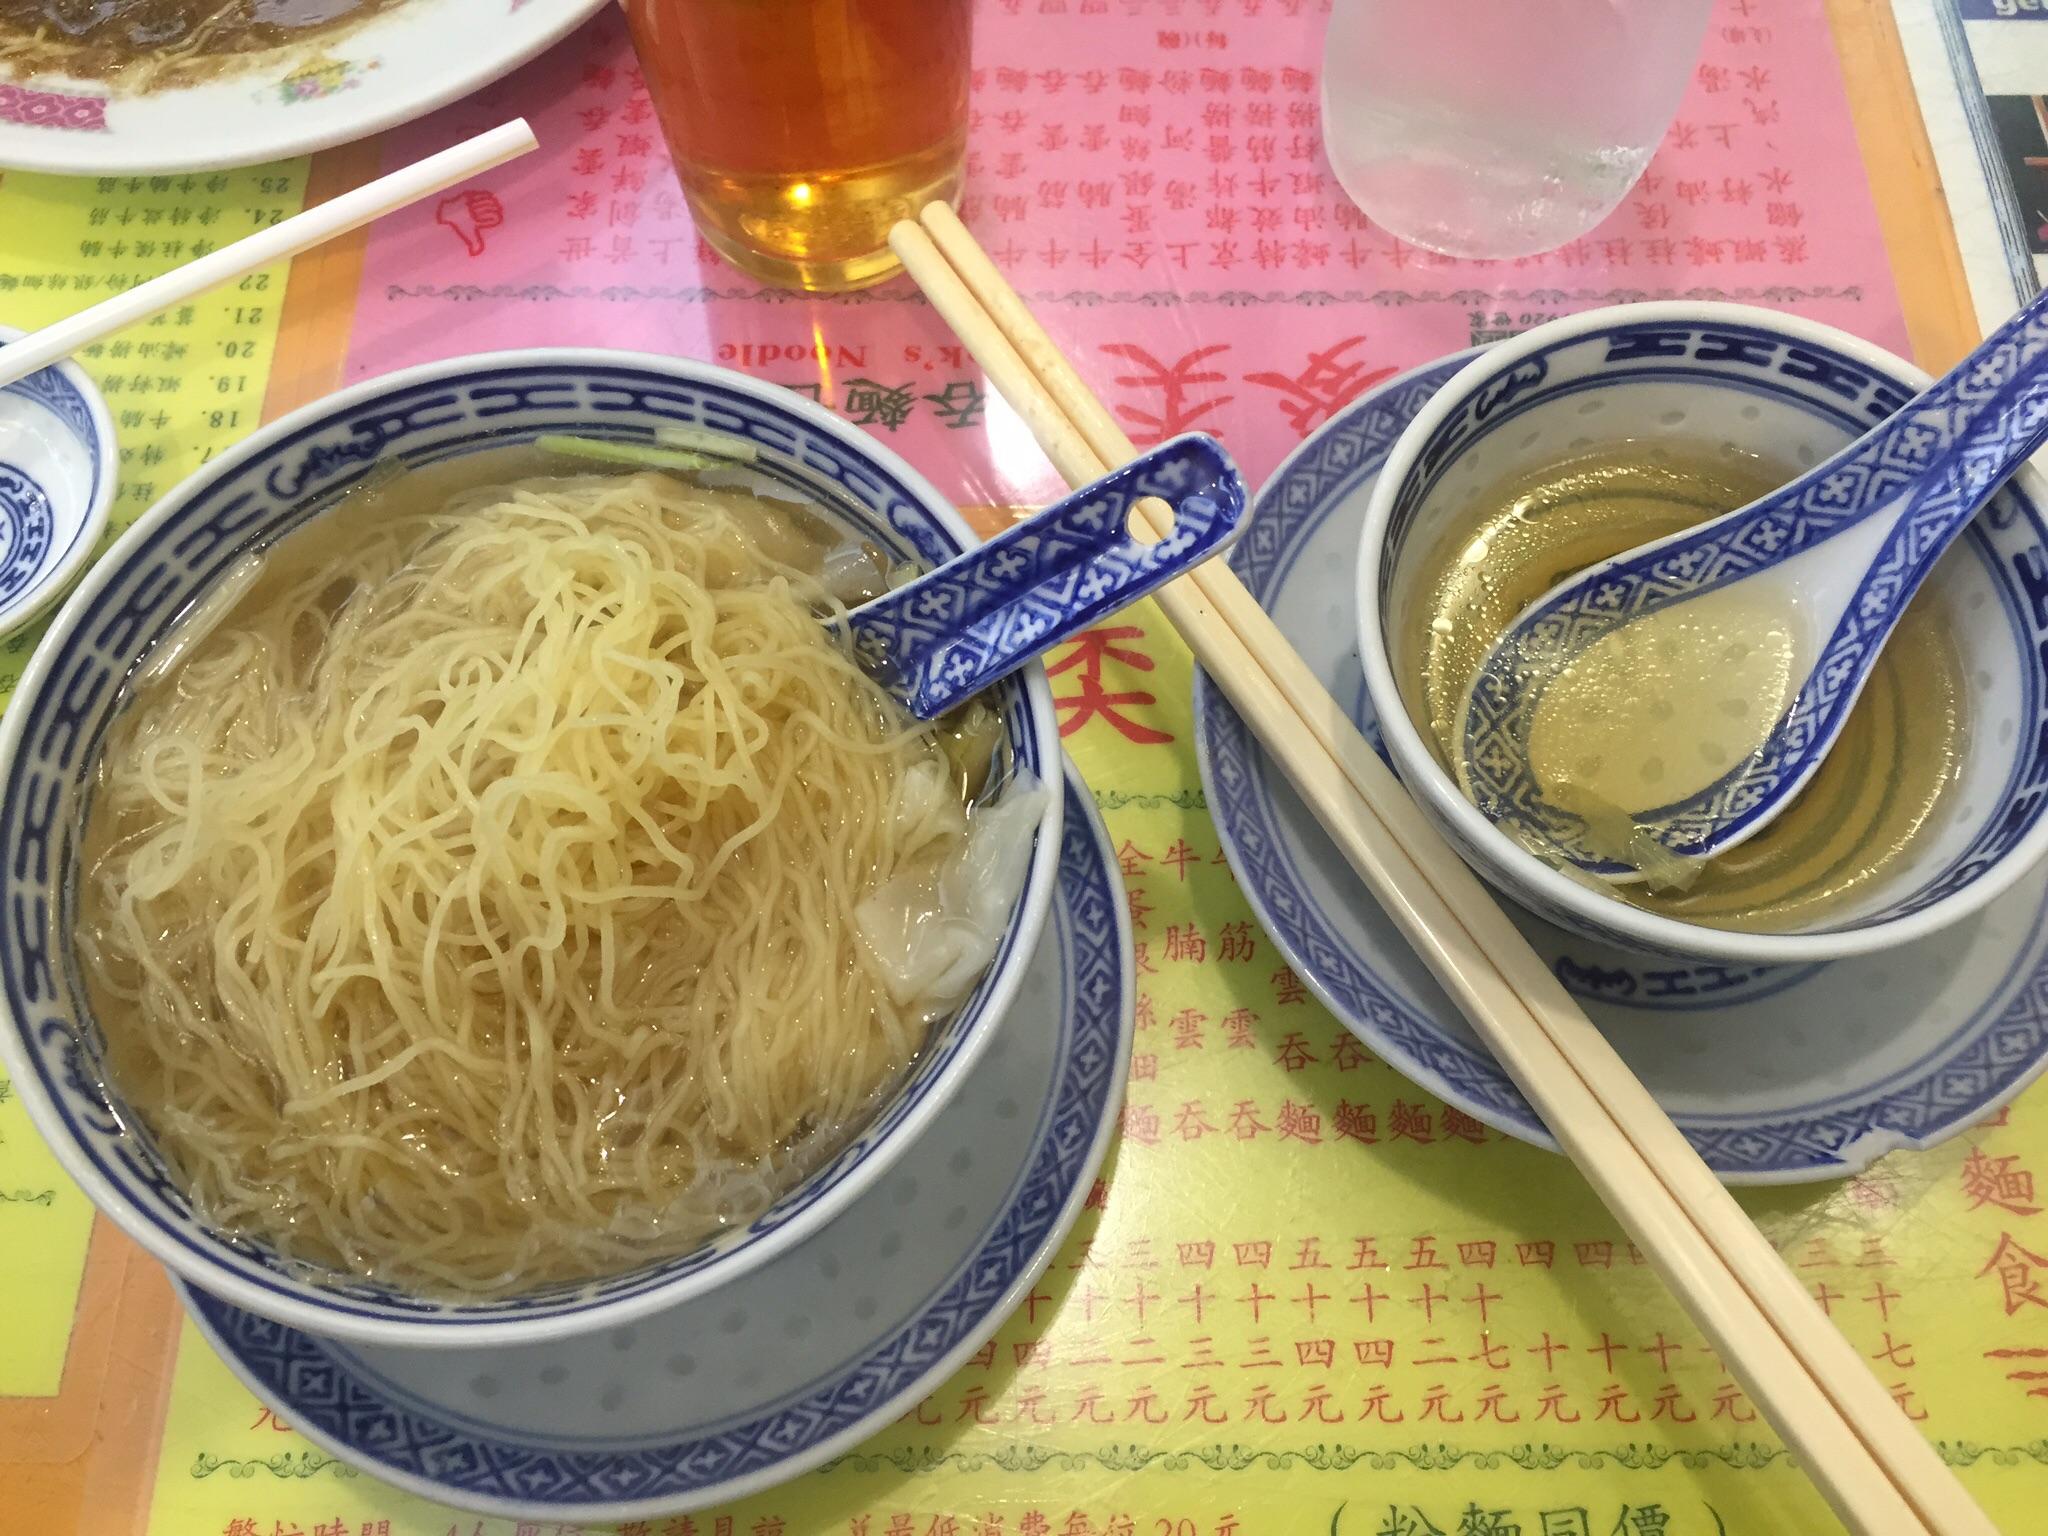 Pork Dumplings with Noodles in Soup at Mak's Honk Kong.